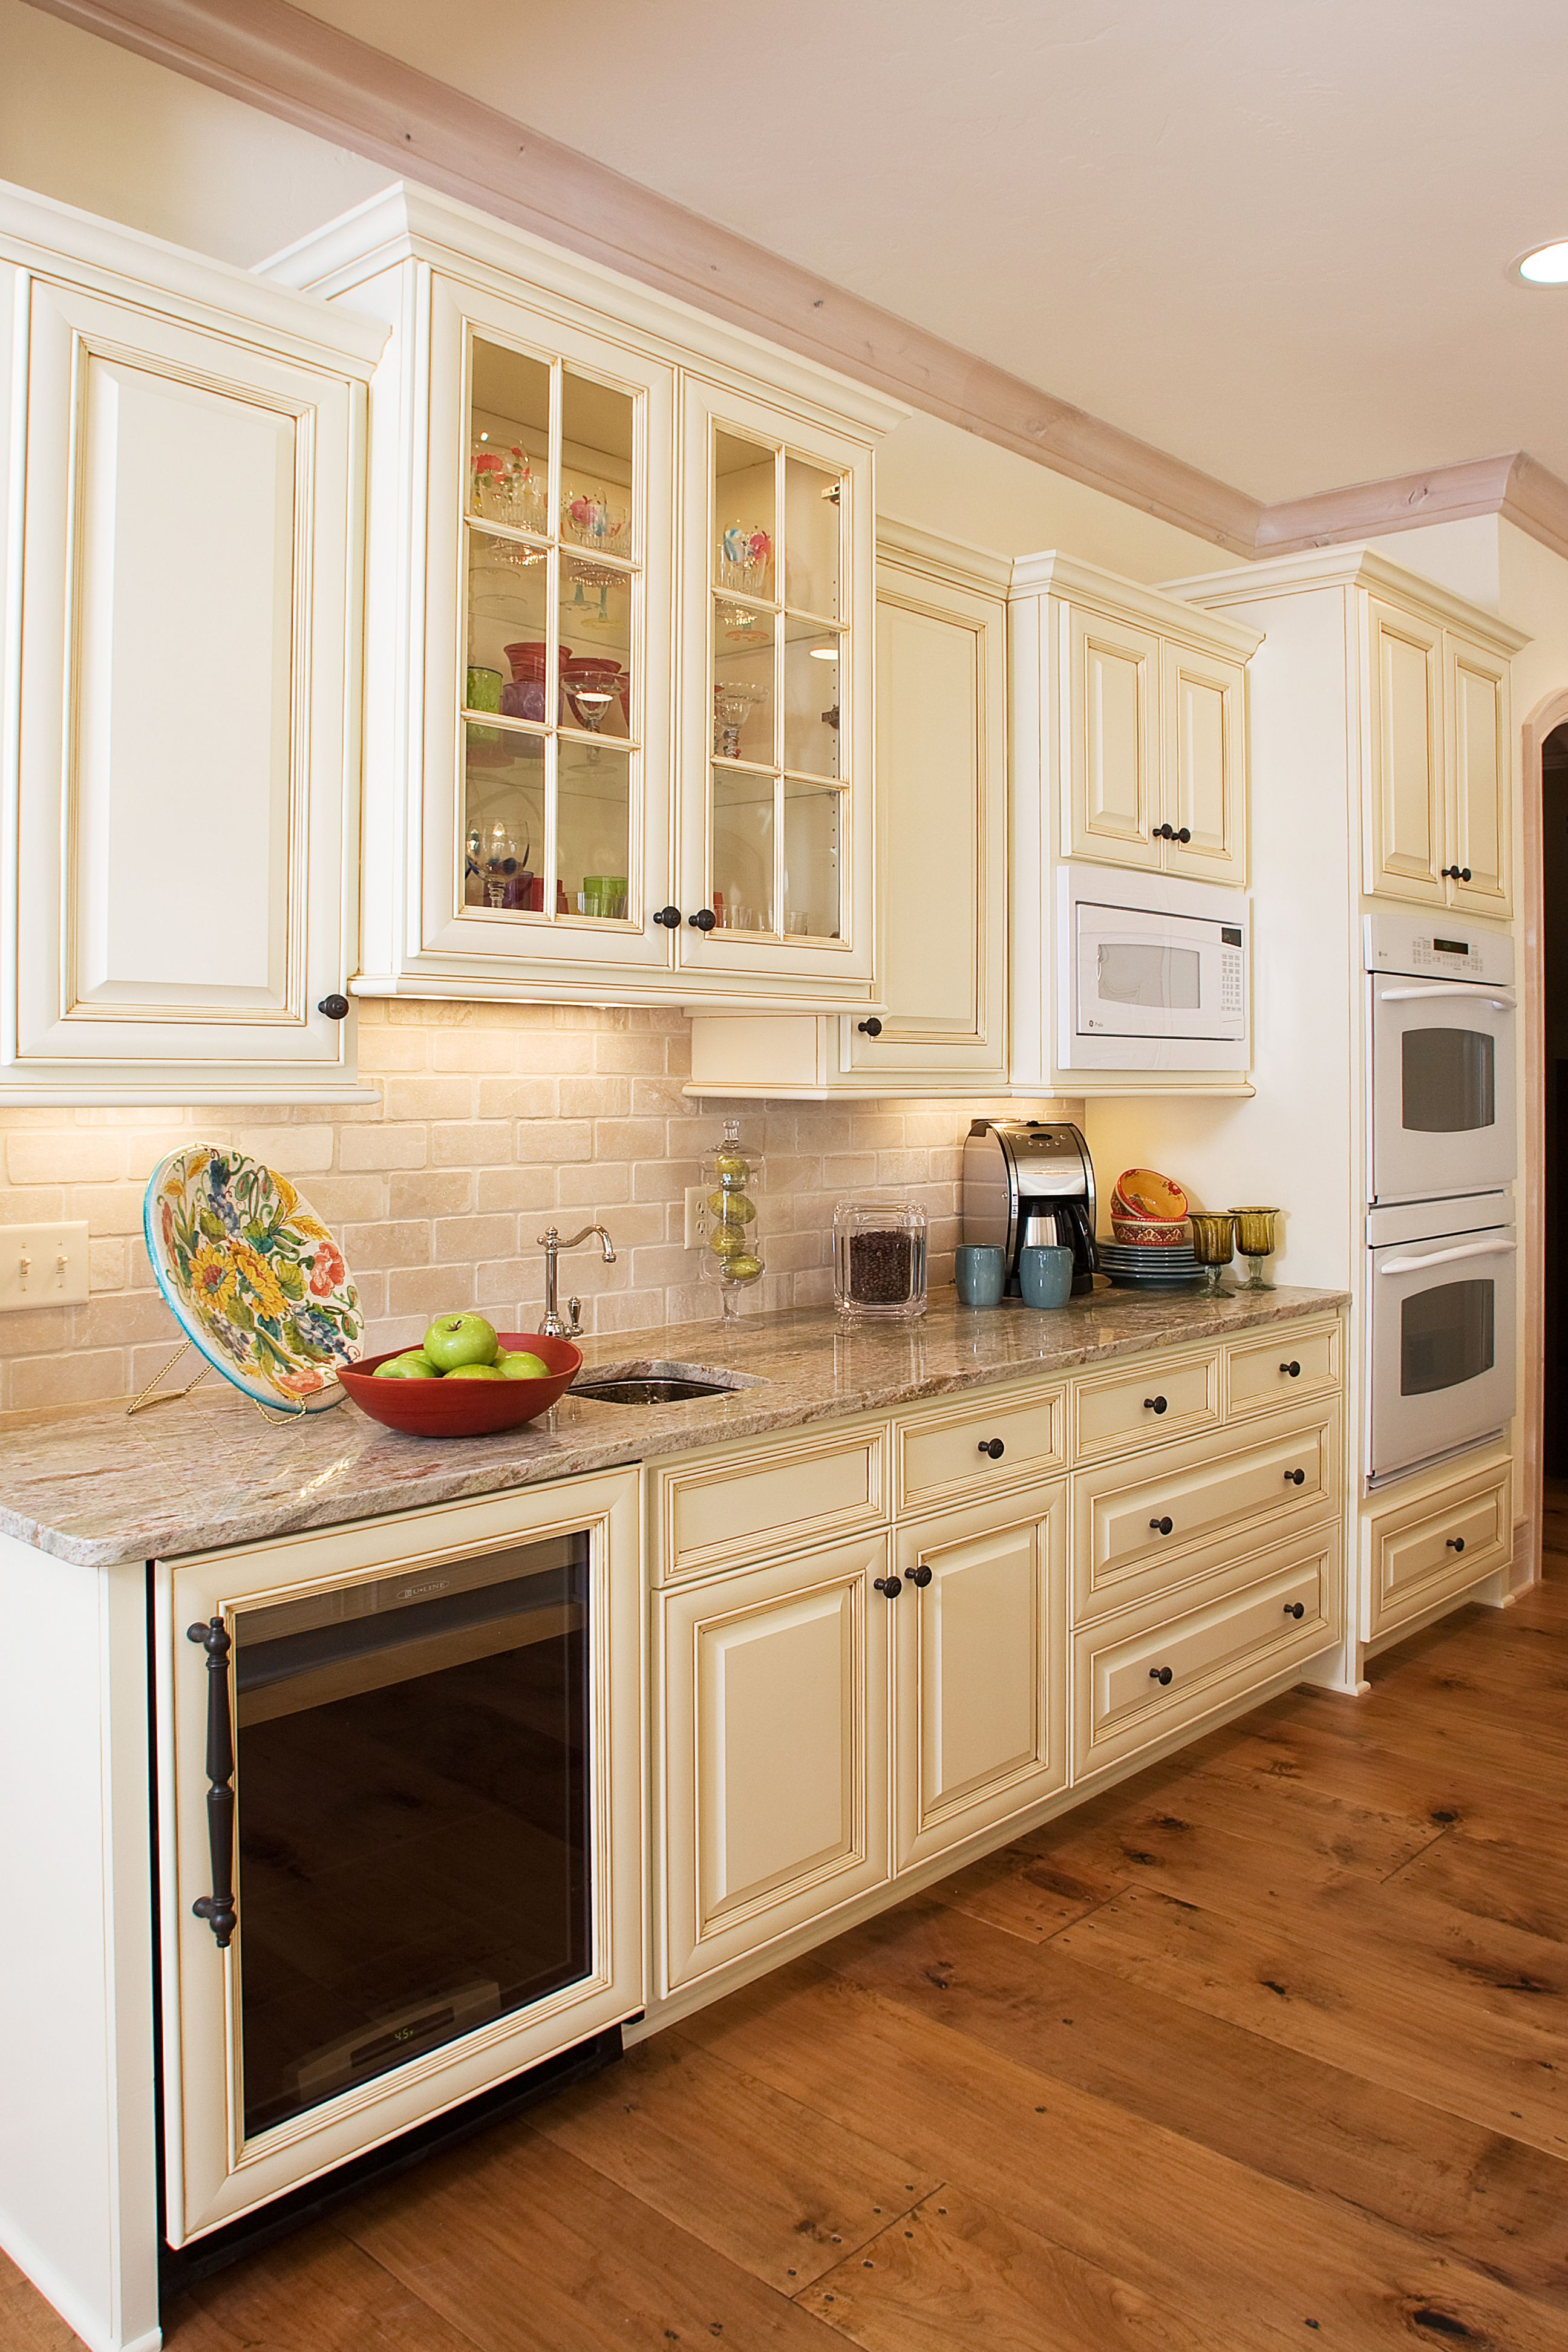 Barenzbuilders Painted Kitchen Cabinets Off White Kitchen